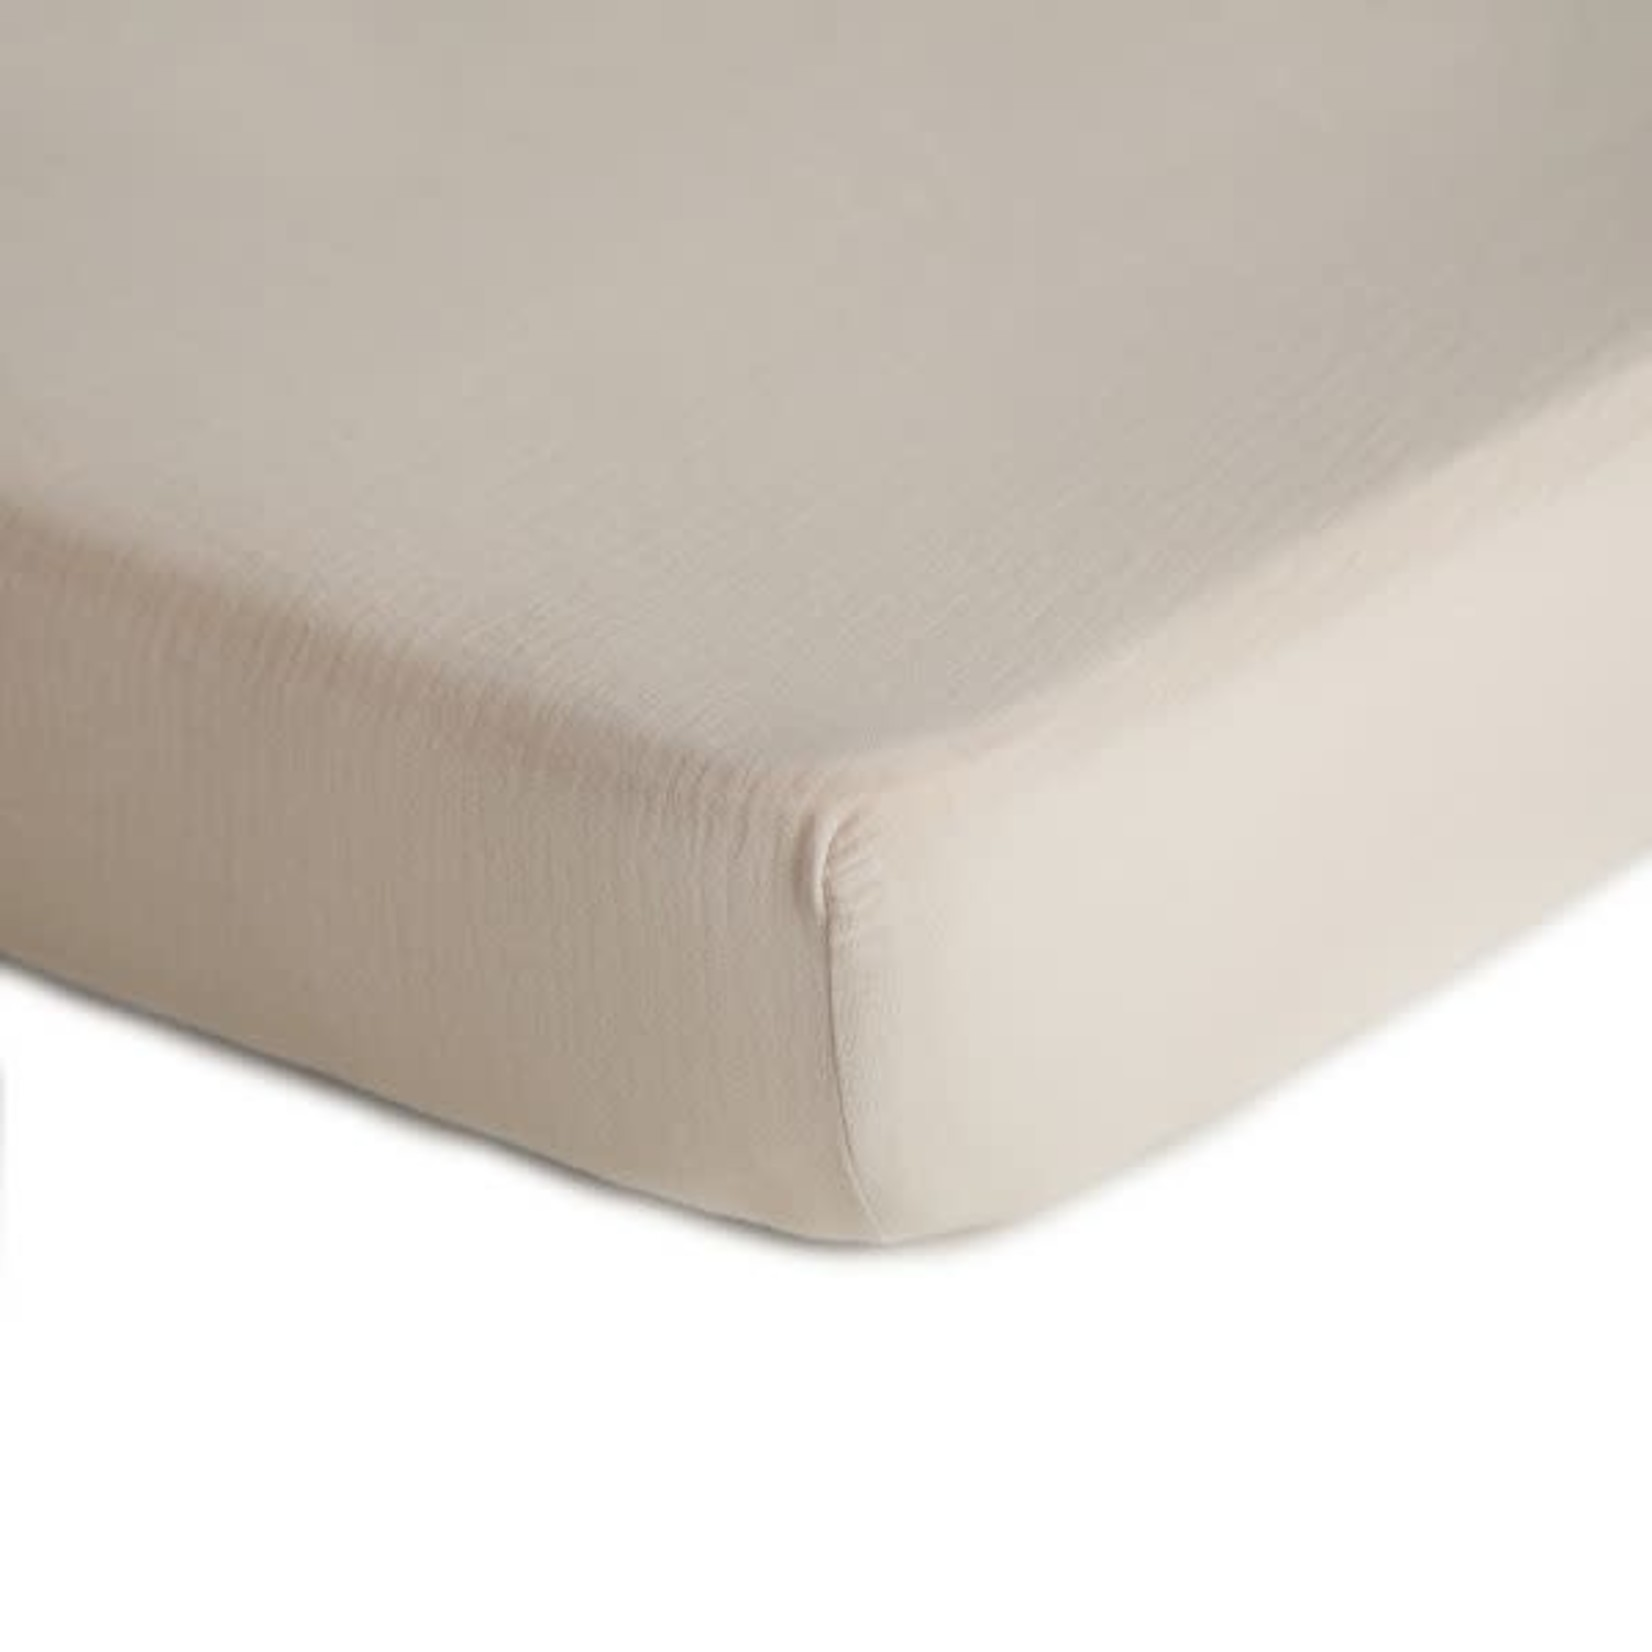 Mushie & Co Extra Soft Muslin Crib Sheet (Fog)